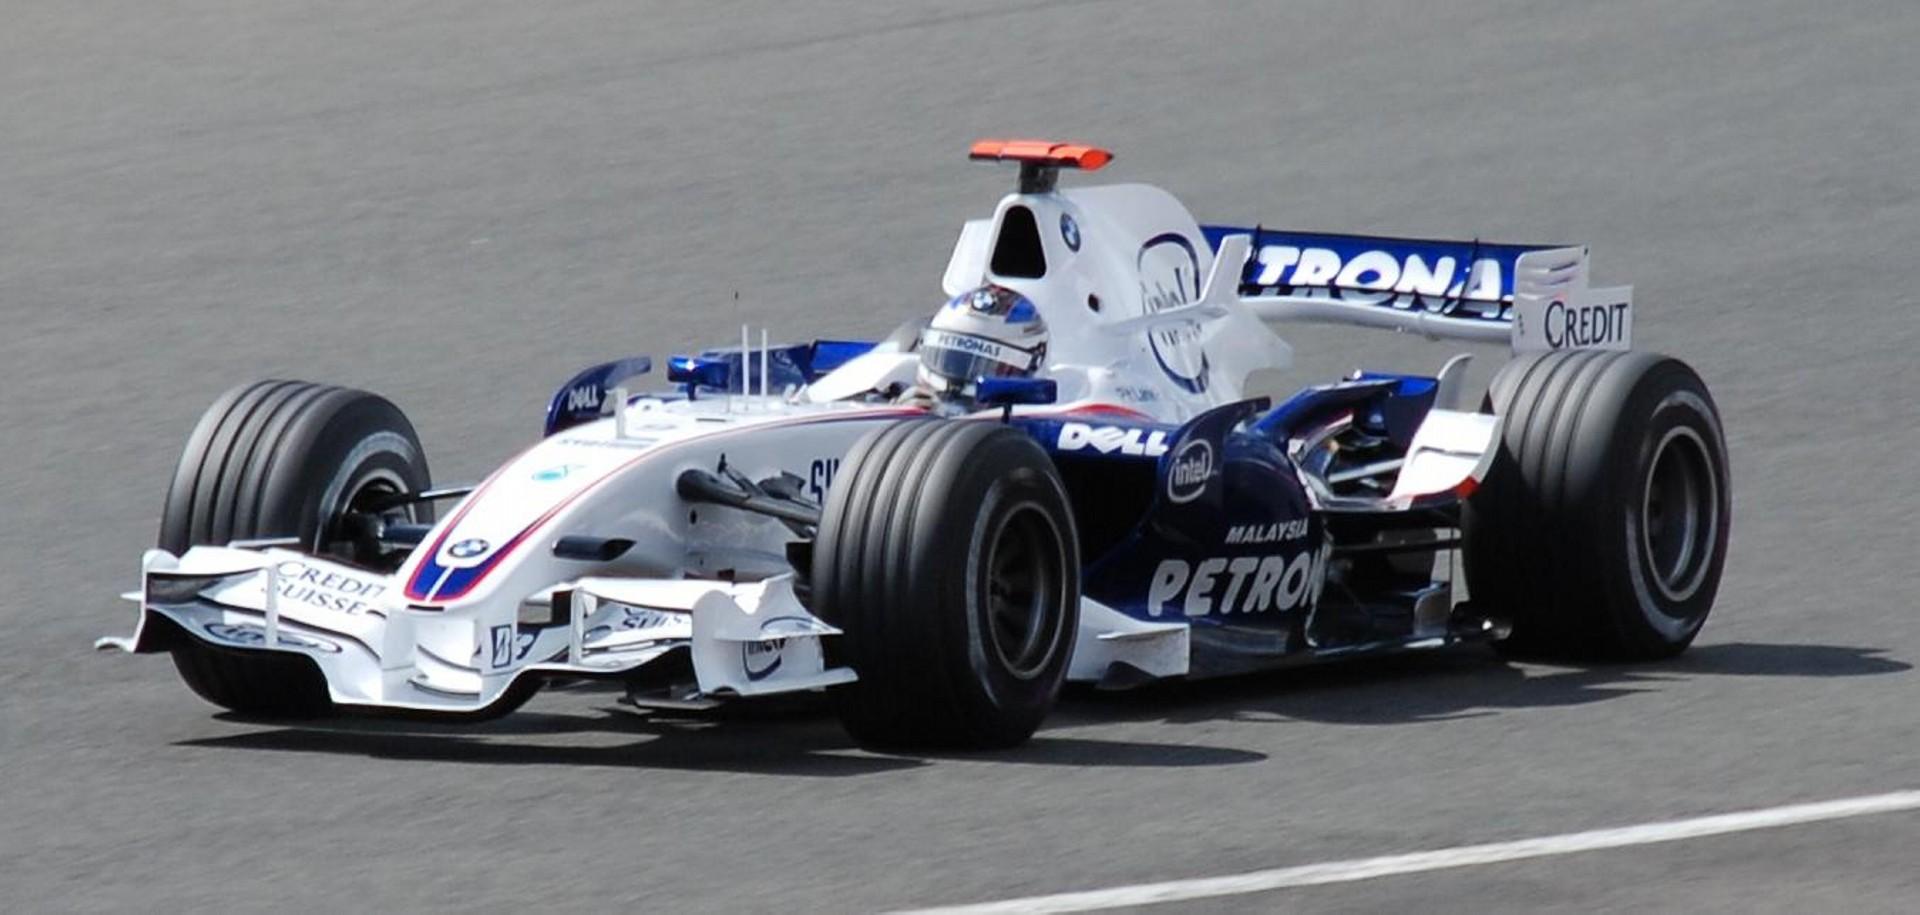 2007 BMW Sauber F1 (3)